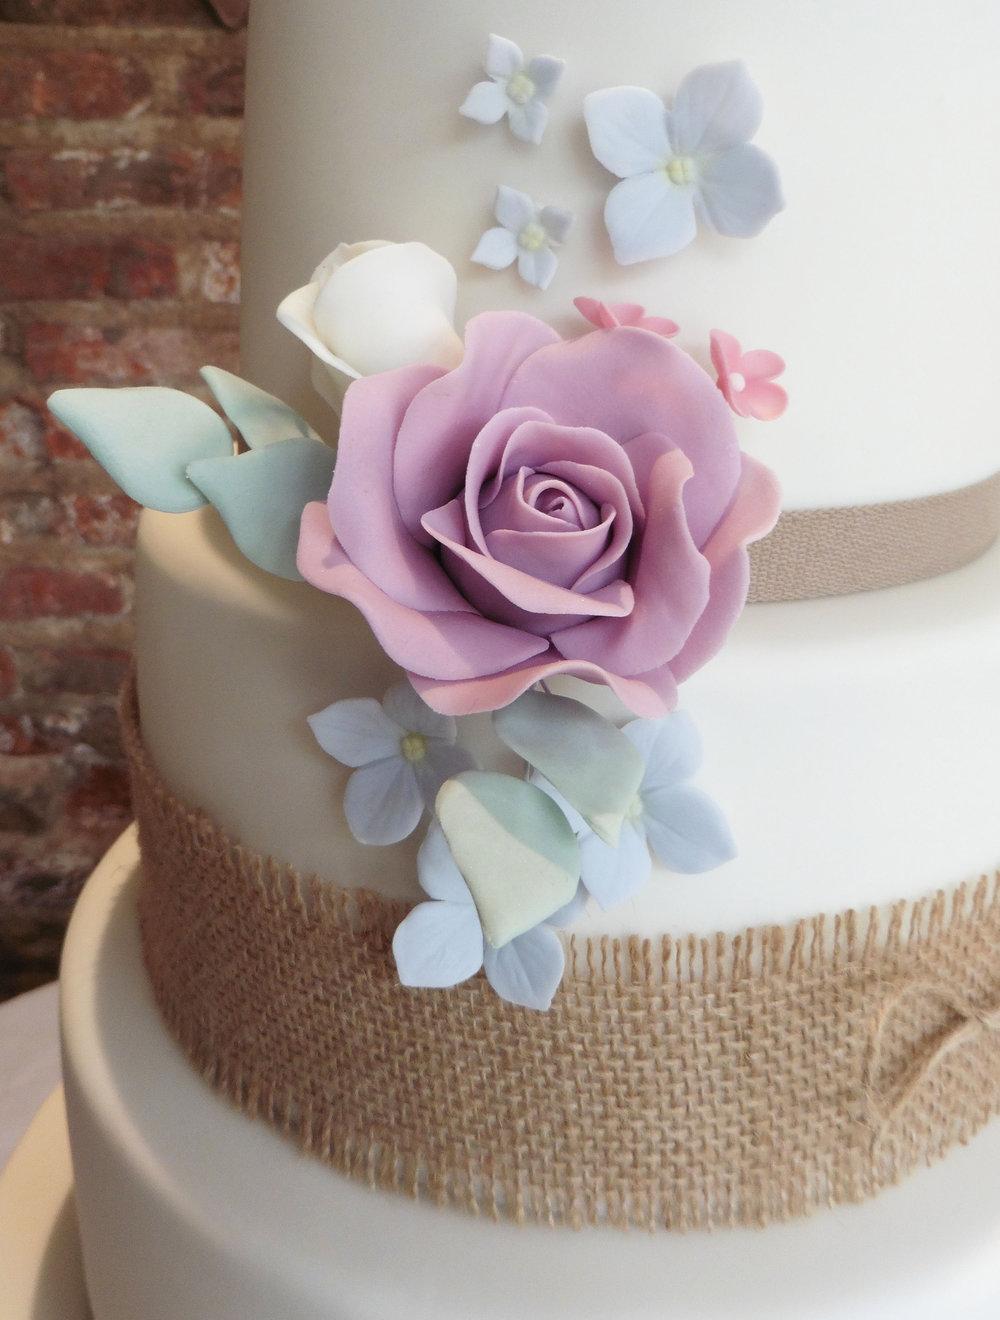 Sugar rose and hydrangea wedding cake